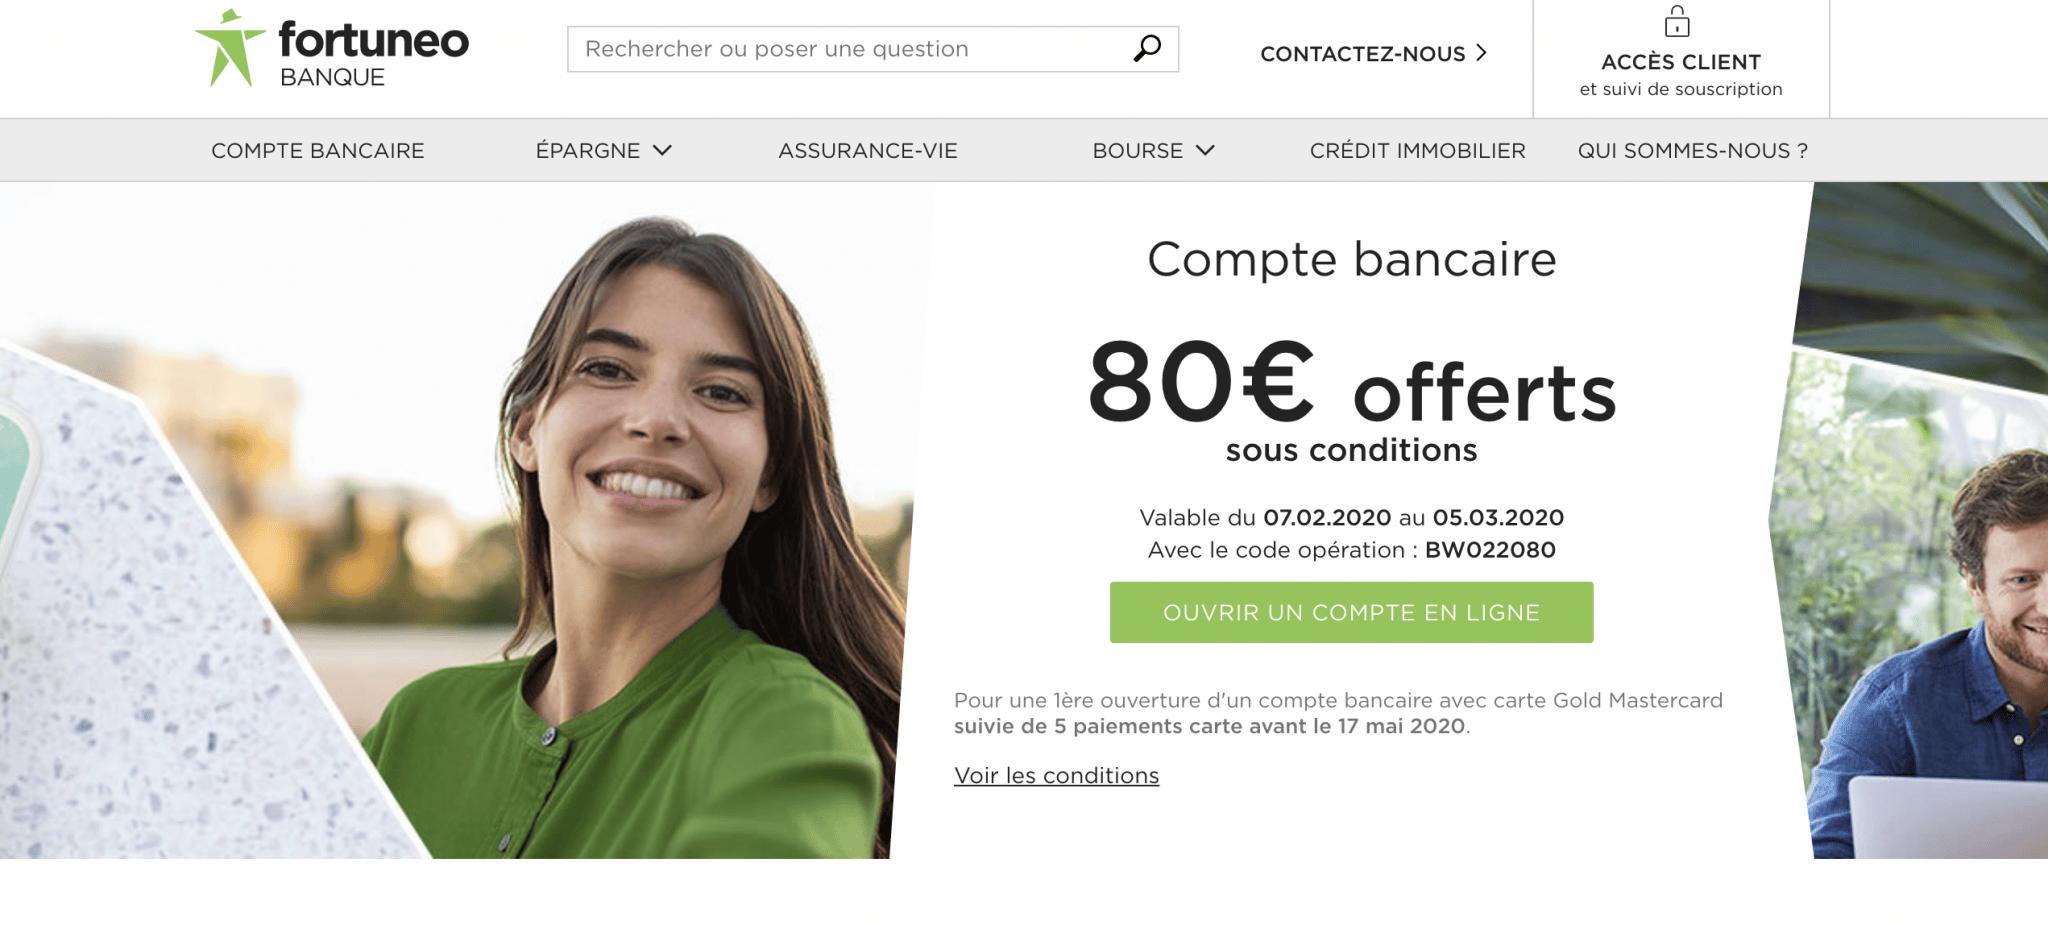 La banque en ligne Fortuneo